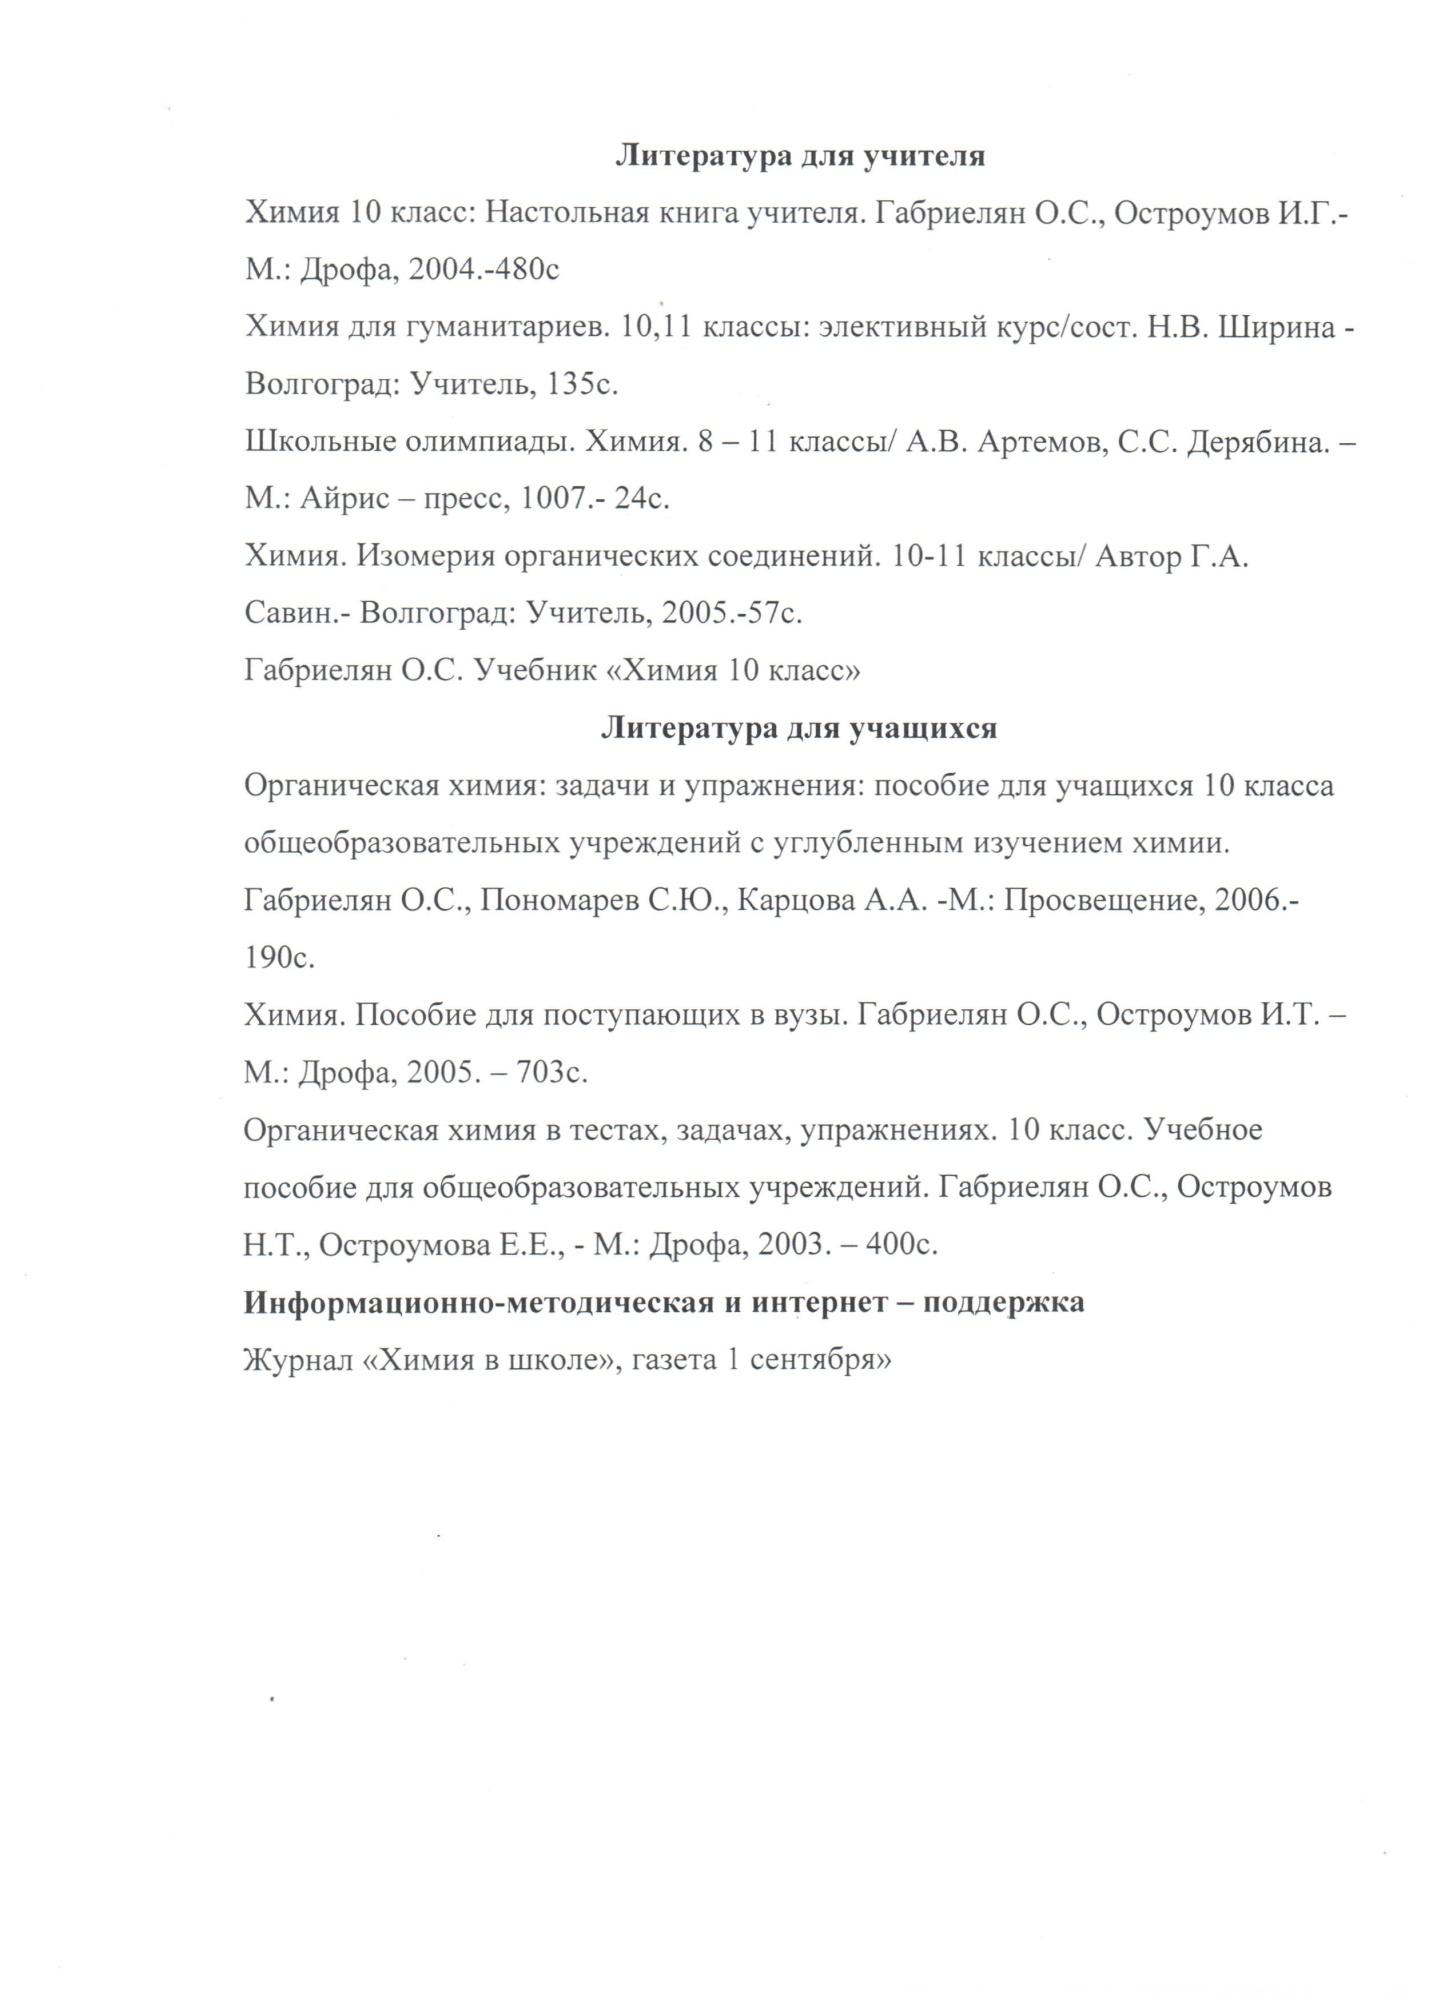 C:\Users\Леха\Desktop\м.и\5.jpg